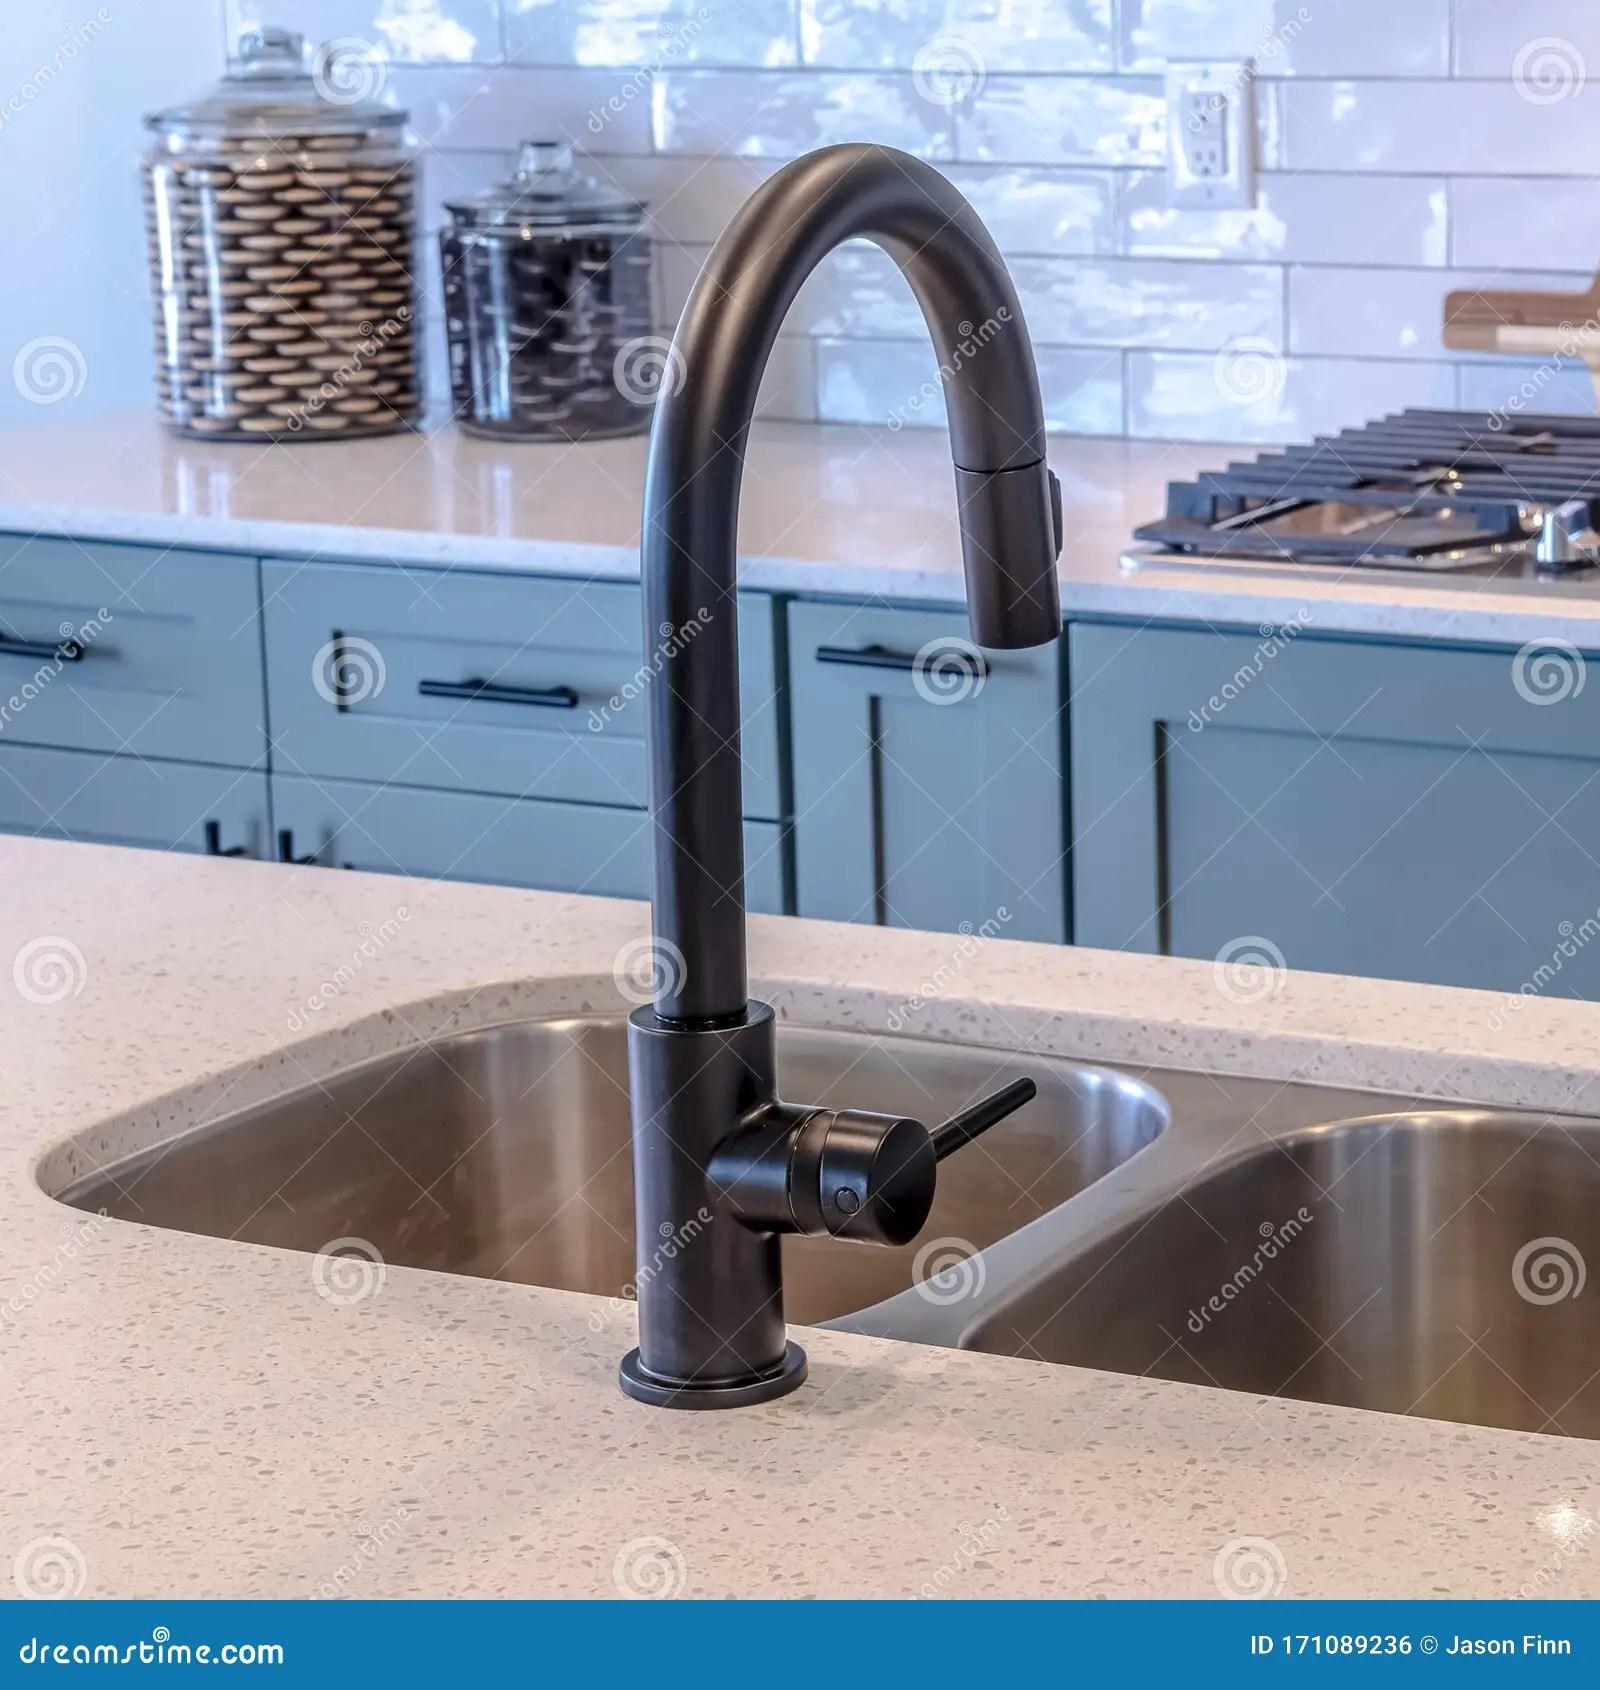 https www dreamstime com square kitchen island double sink black faucet against cooktop tile backsplash wooden cabinets handles can also be seen image171089236